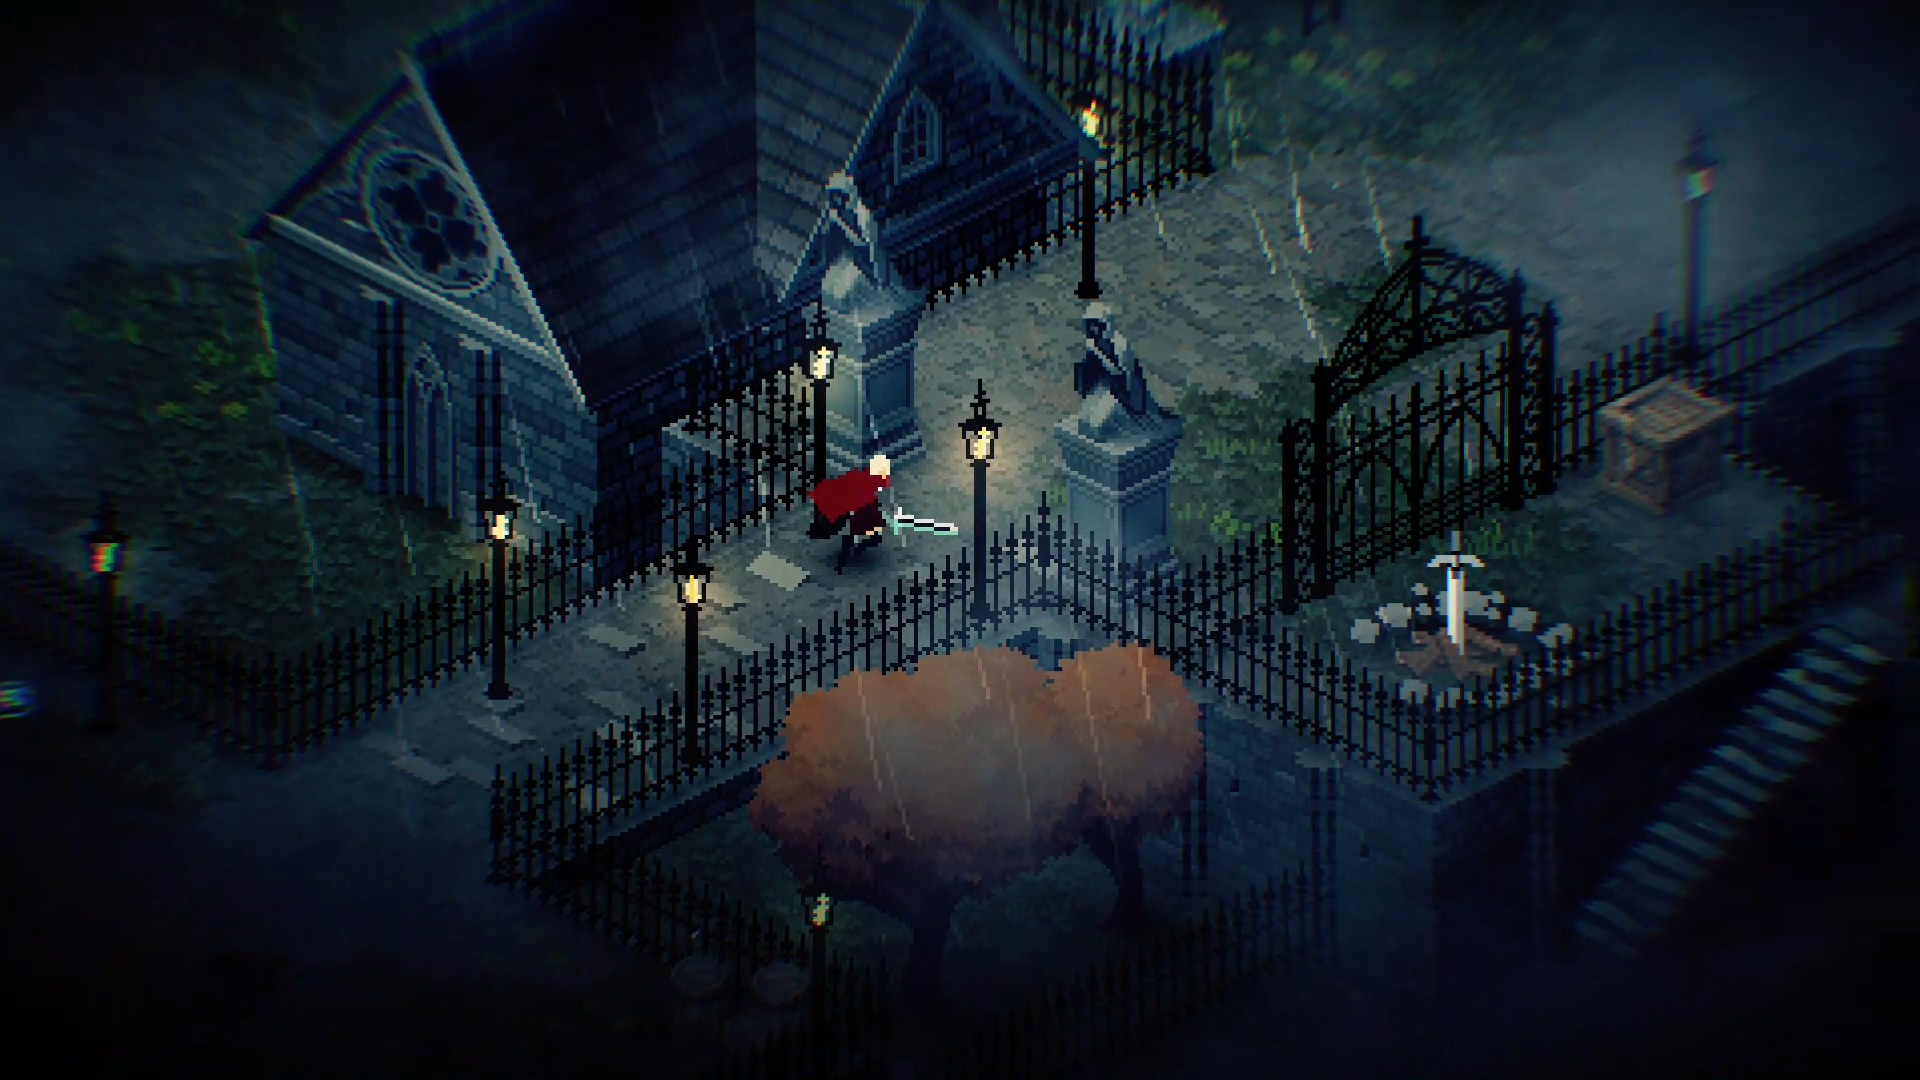 Chrono Sword Screenshot of a heroine running through a pixelated gothic landscape